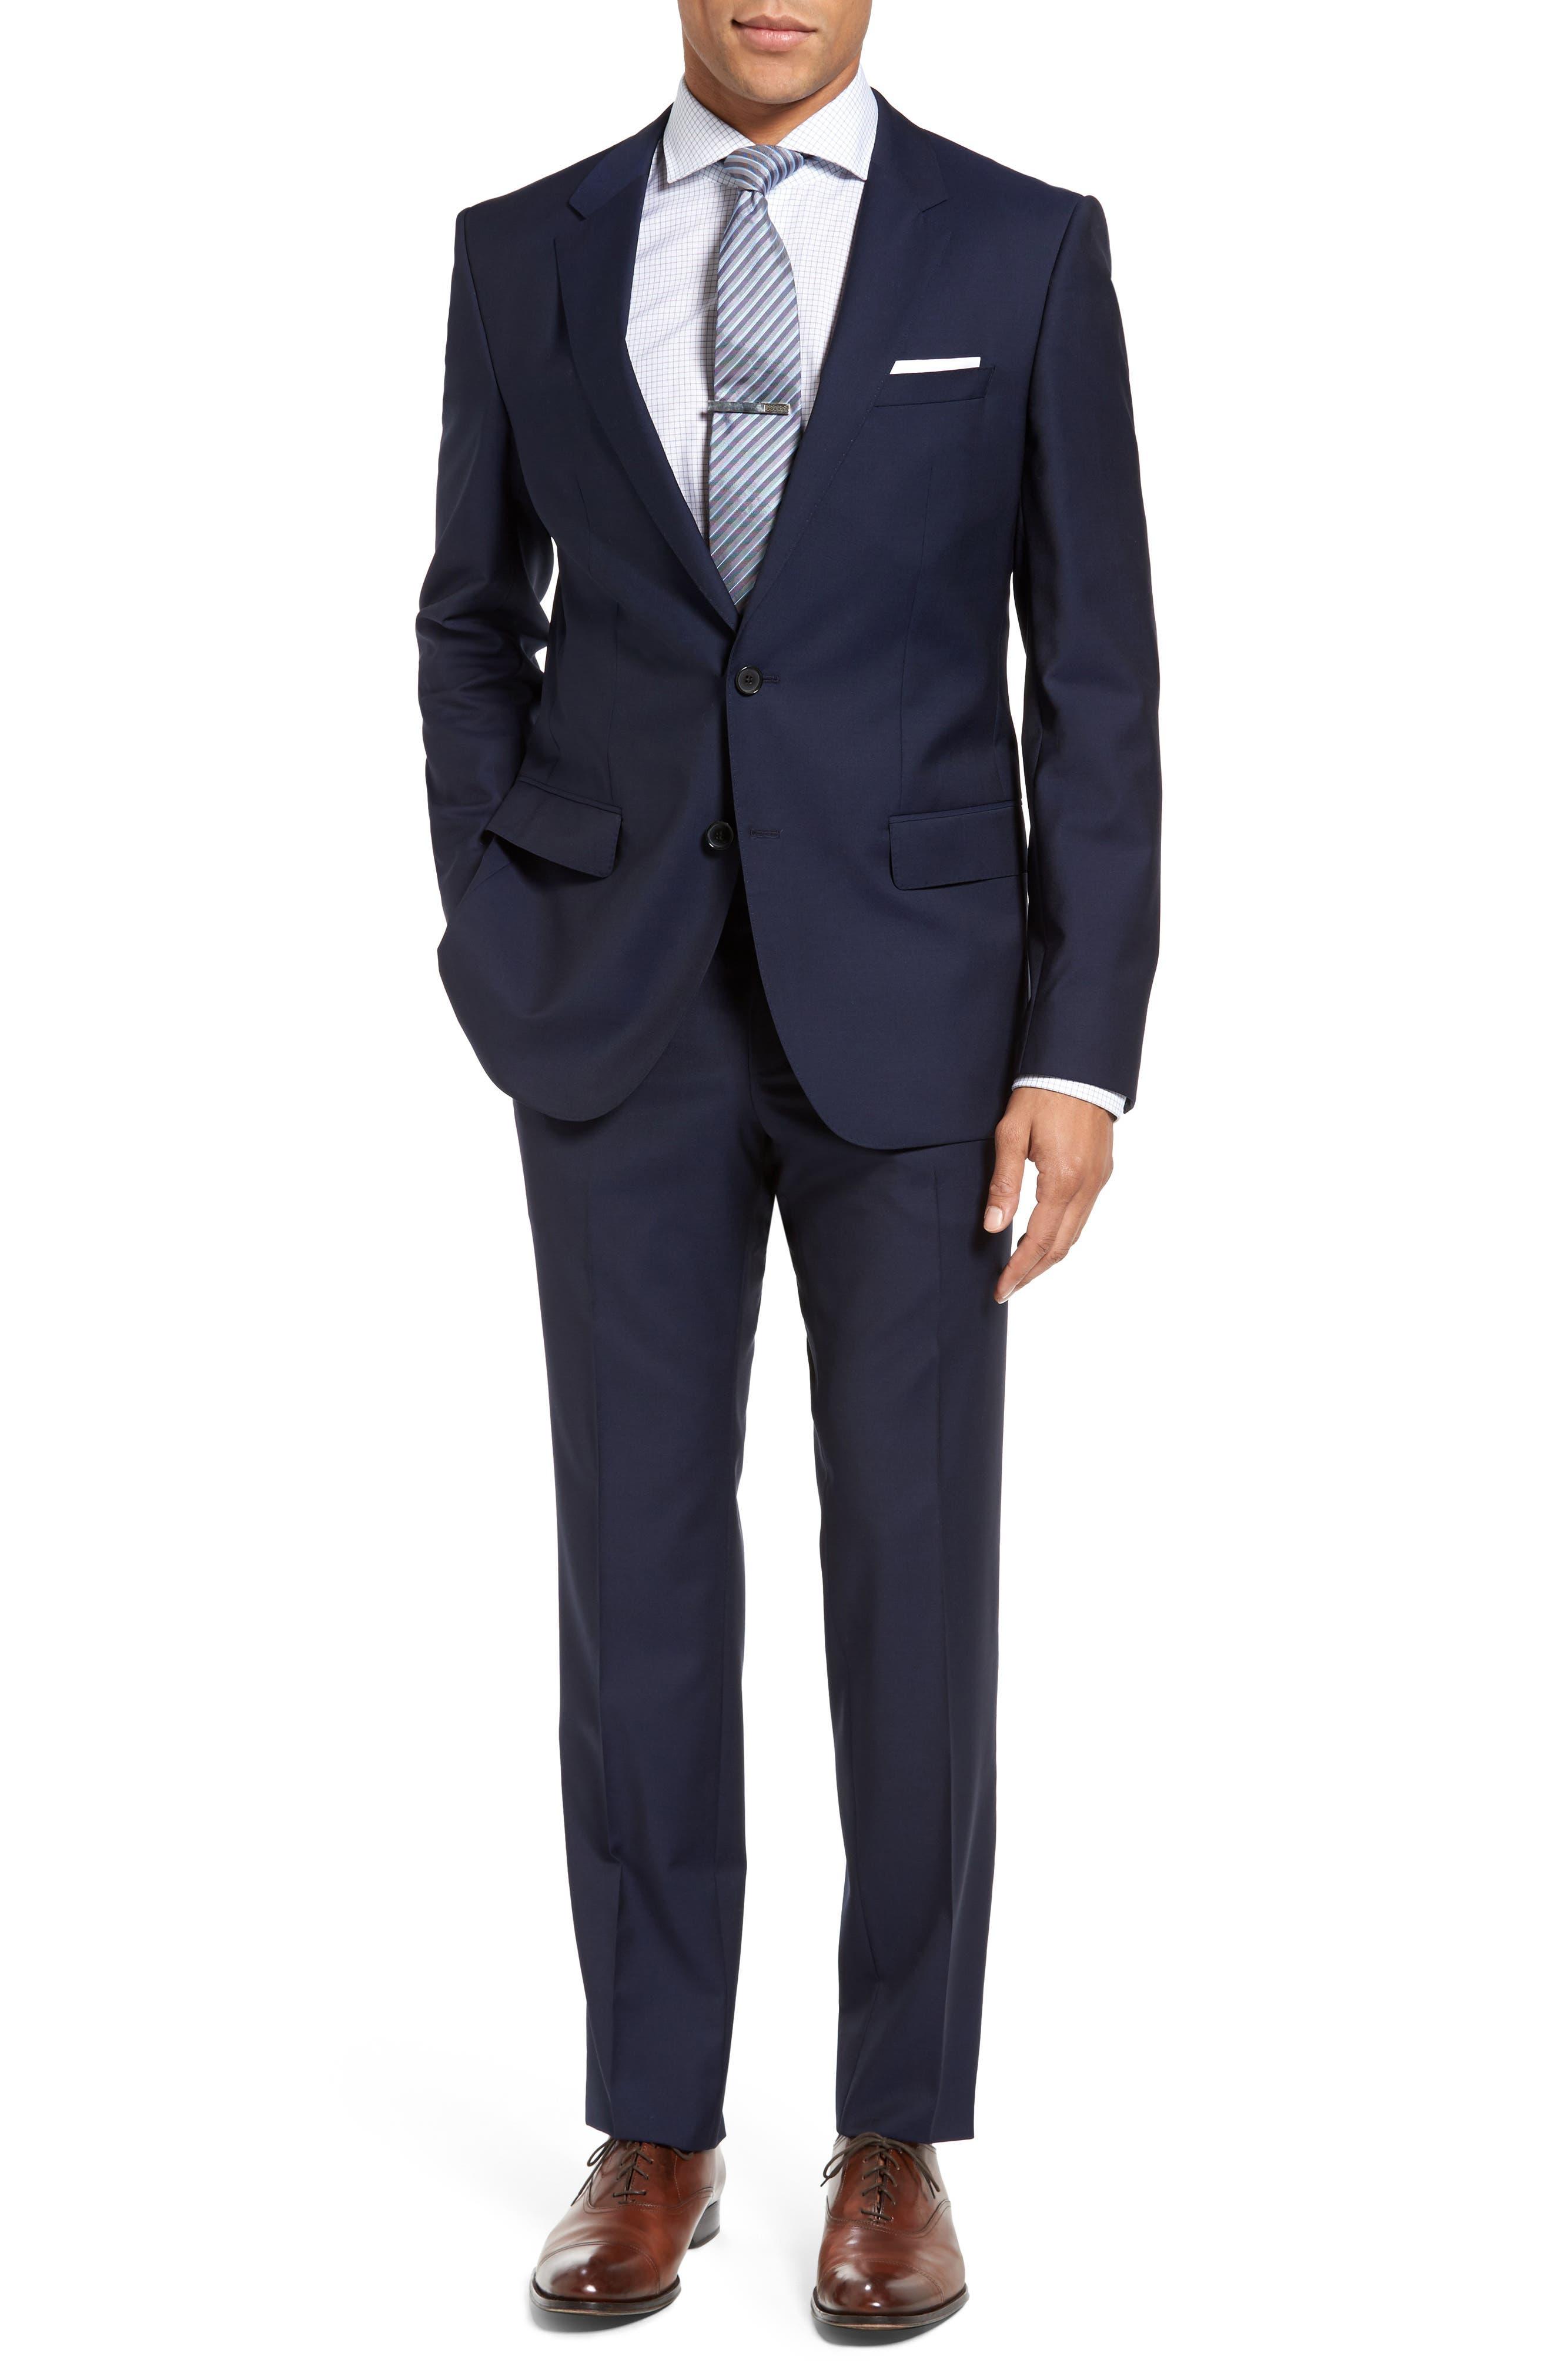 BOSS, Huge/Genius Trim Fit Navy Wool Suit, Main thumbnail 1, color, 410